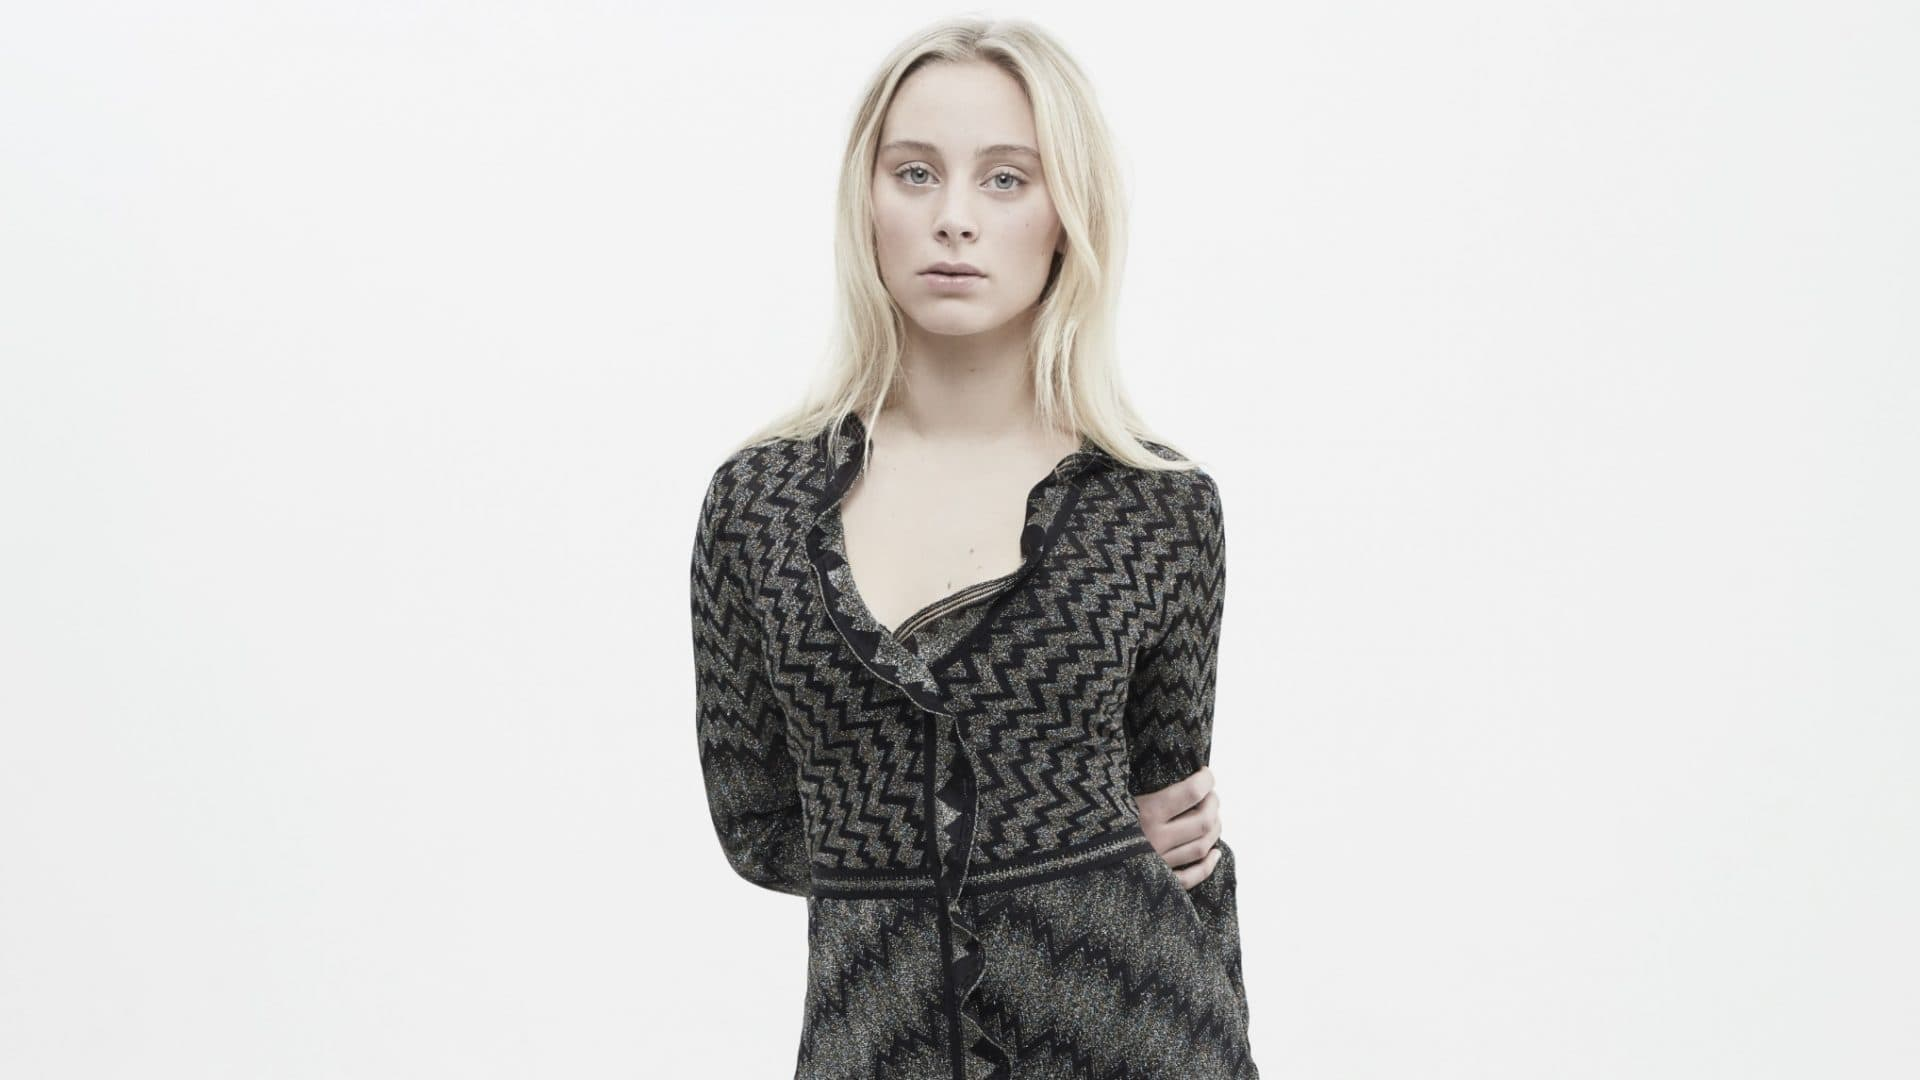 Ida nielsen actress